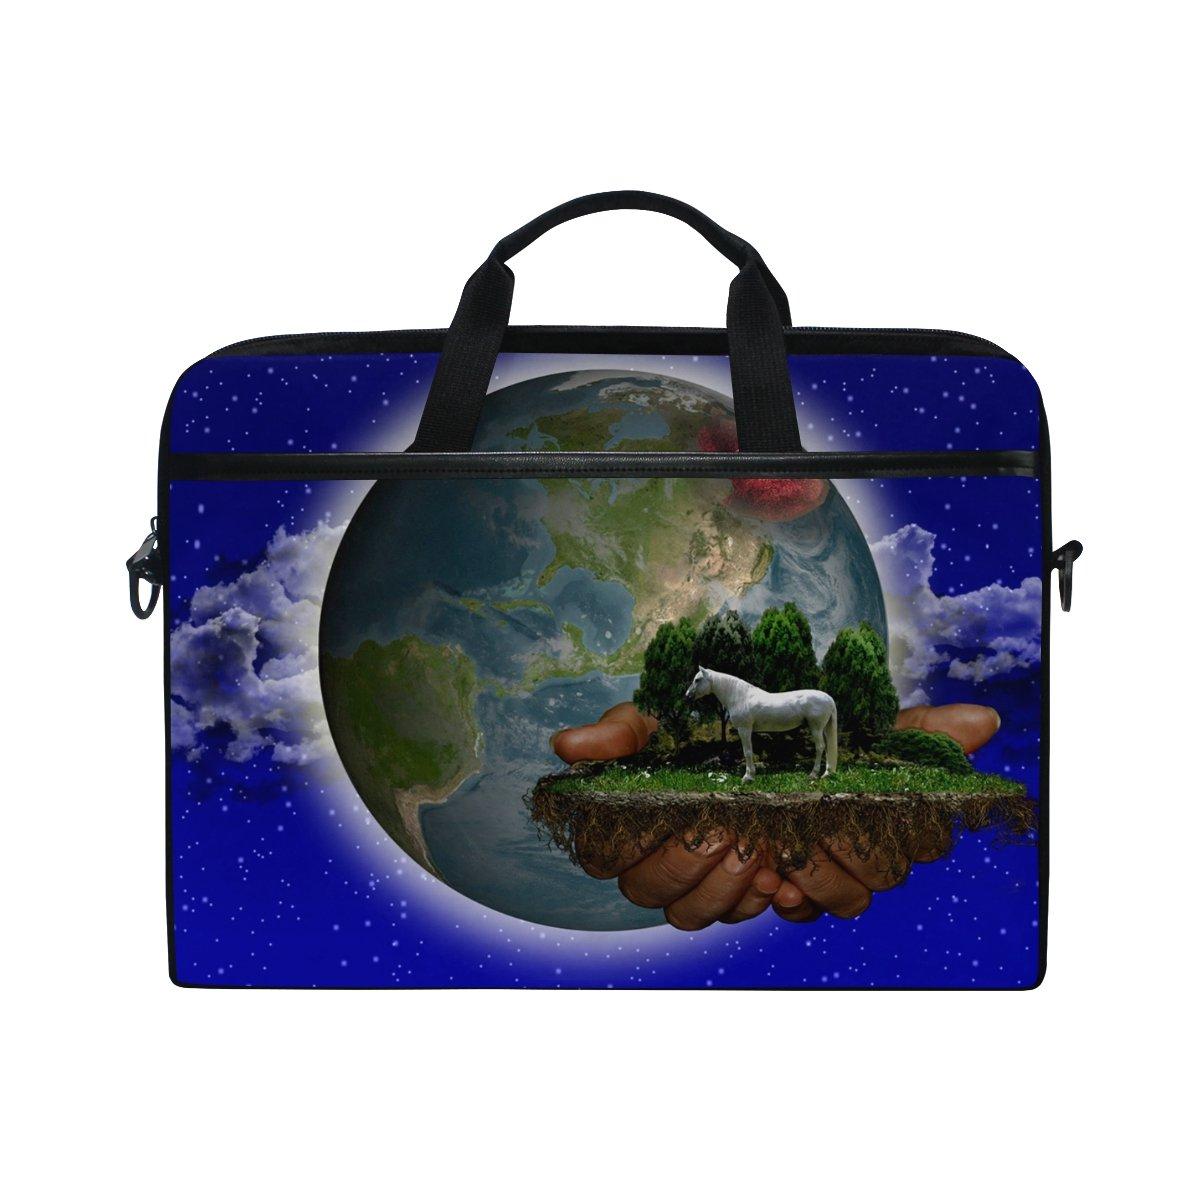 Ahomy Starry Sky World Horse Hands 14.5 14 – 14.5 Hands Pulgadas Multifuncional Tela Impermeable Laptop Case Bag Briefcase Bandolera 2f30d8